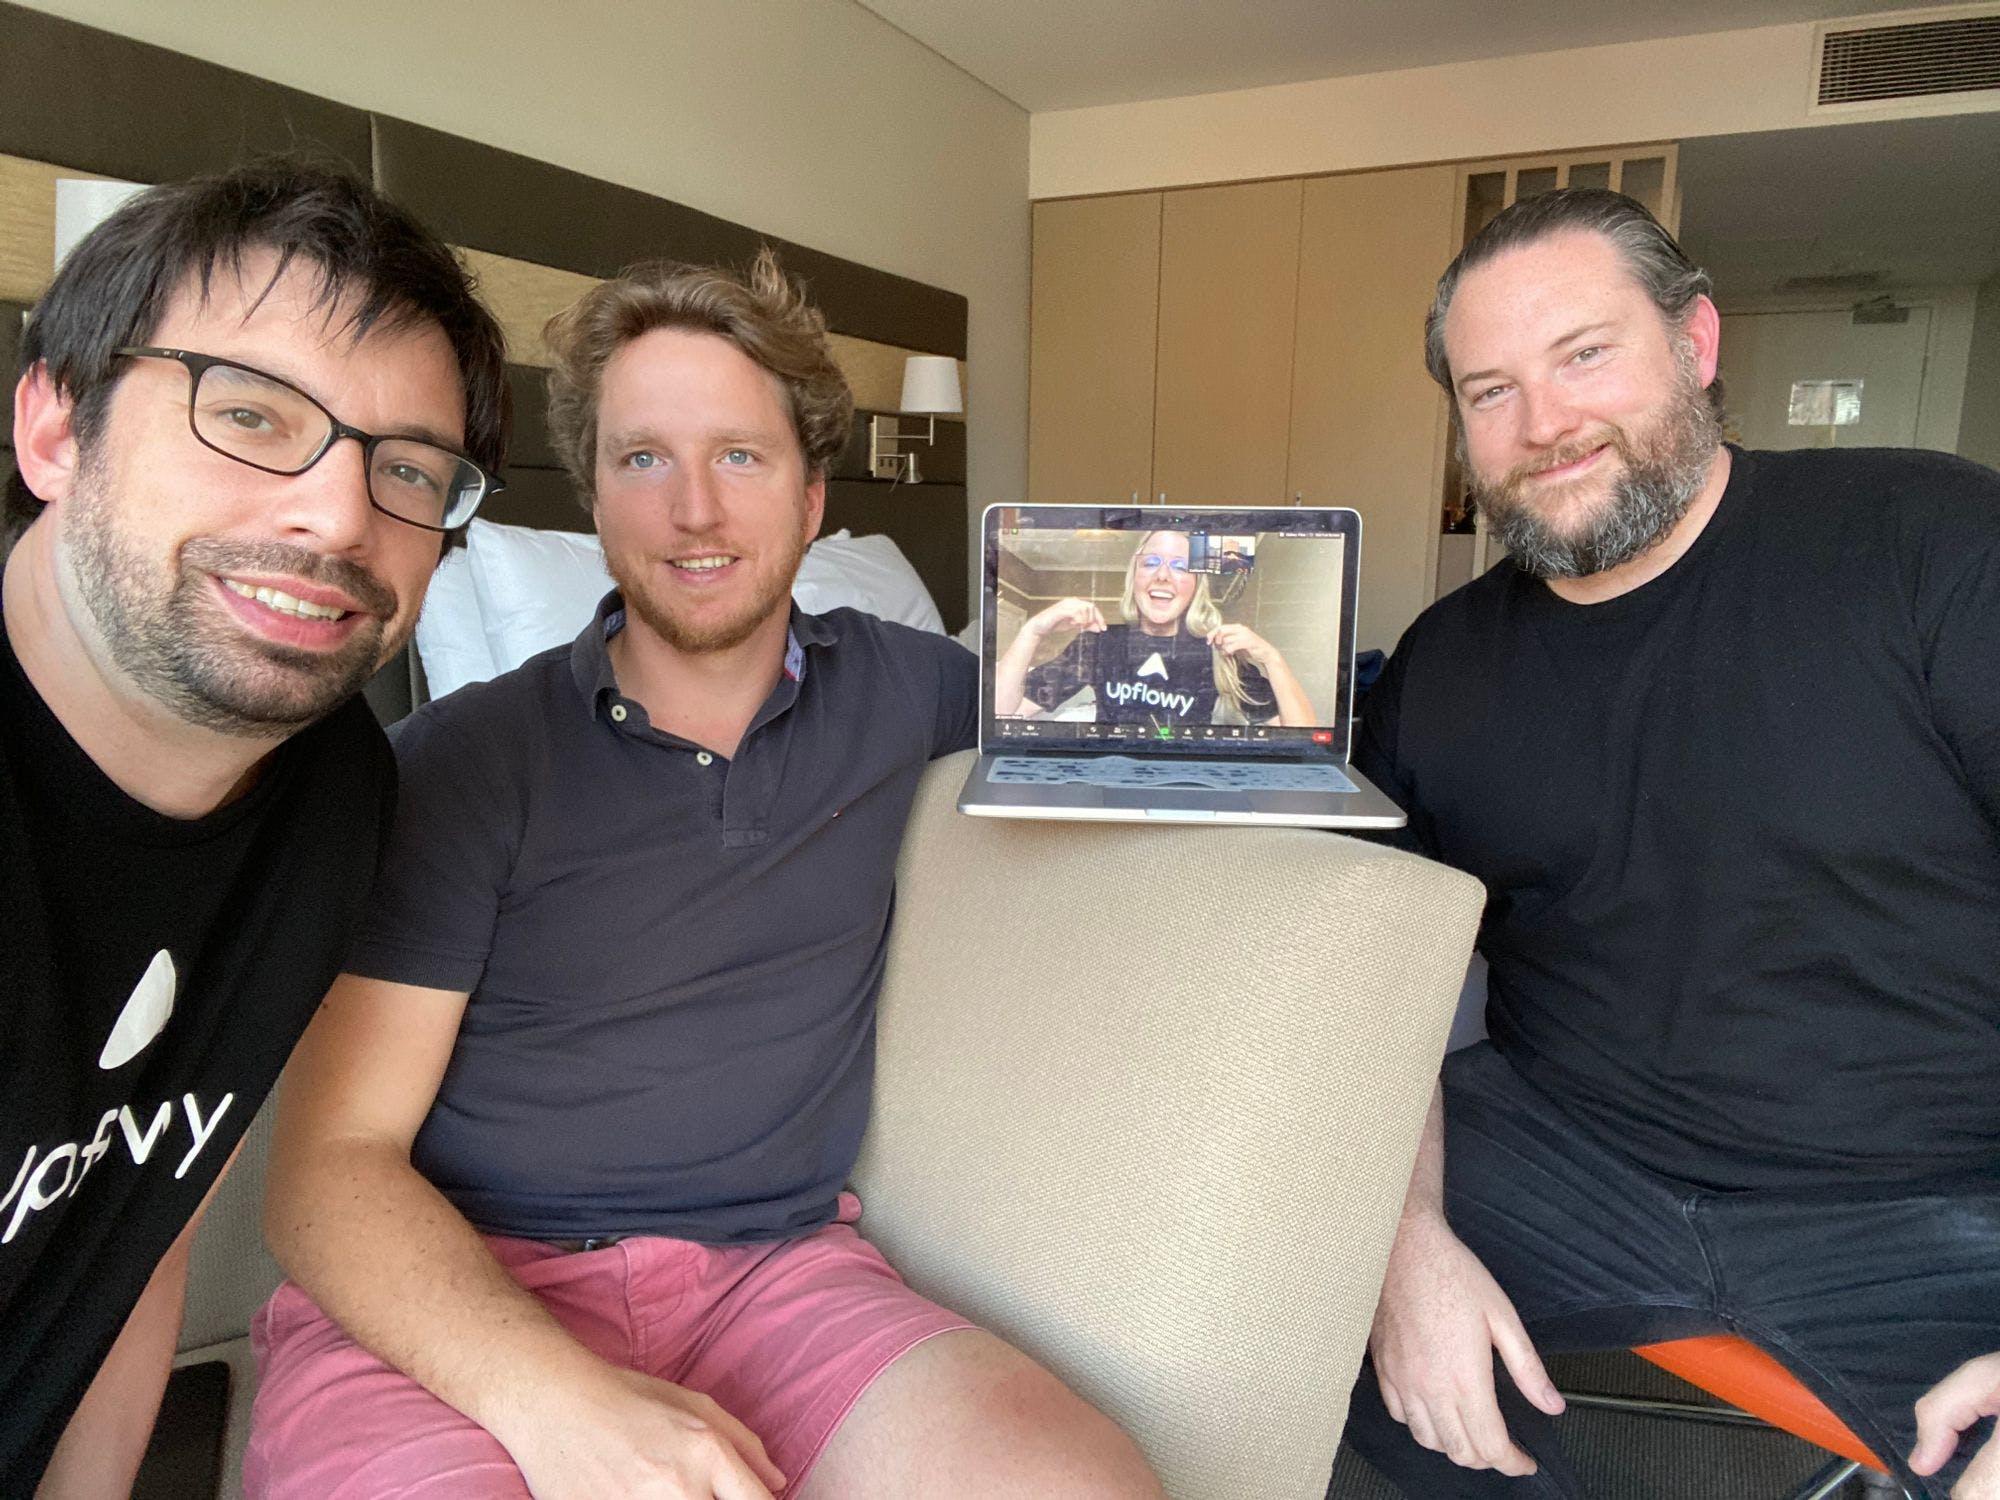 Covid-style team photo.